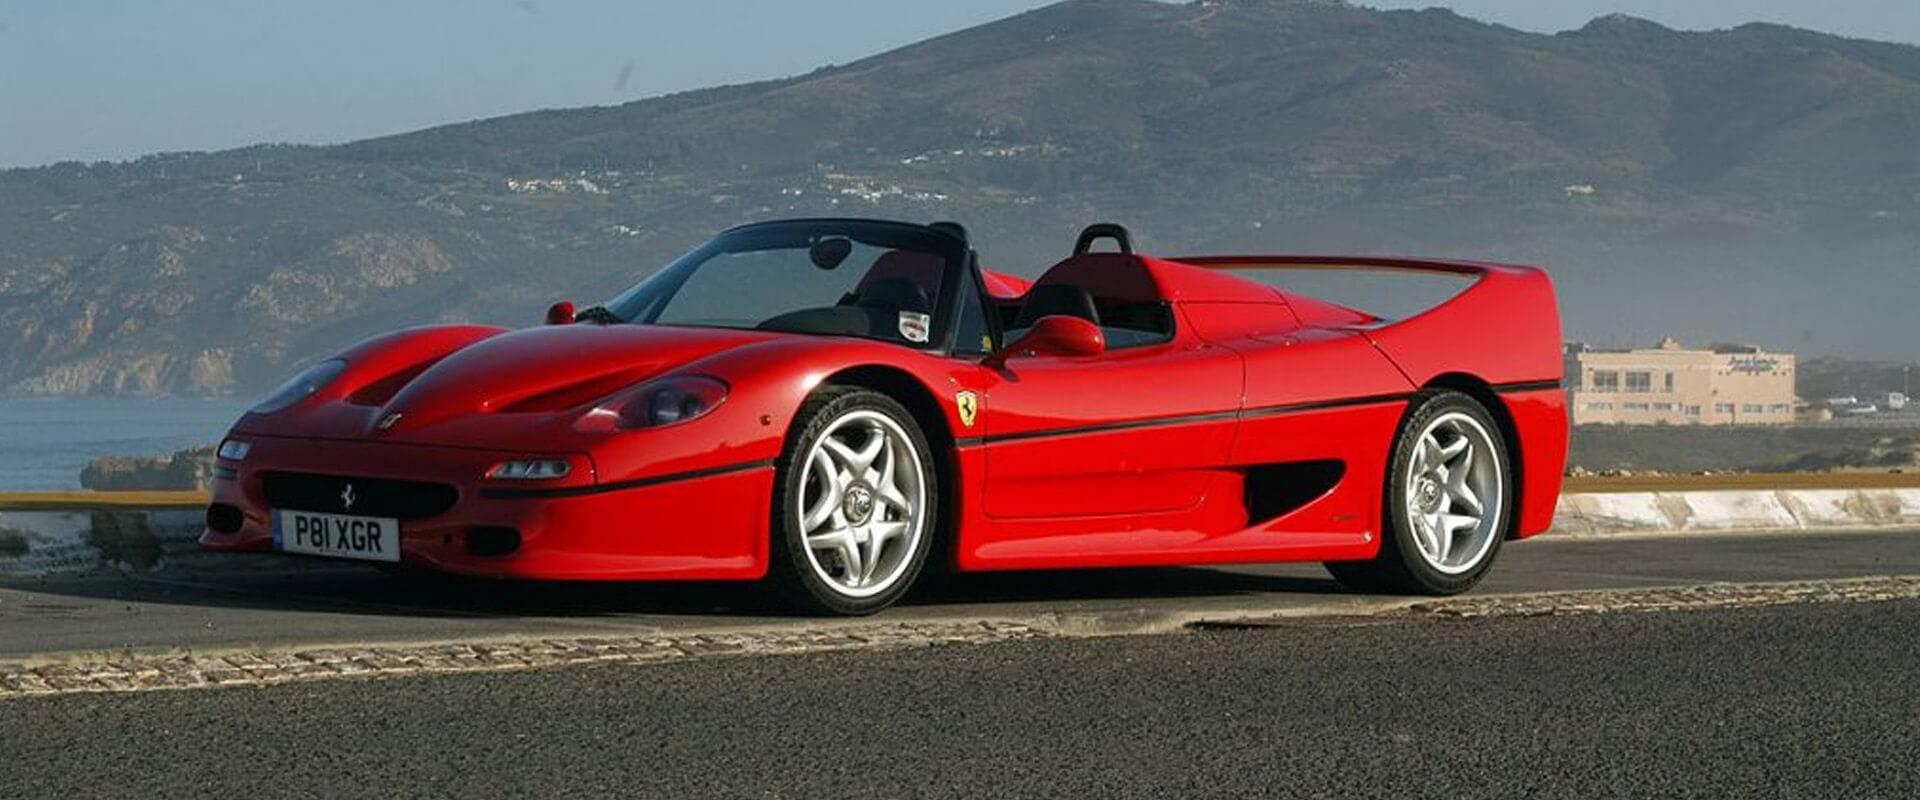 The Ferrari F50